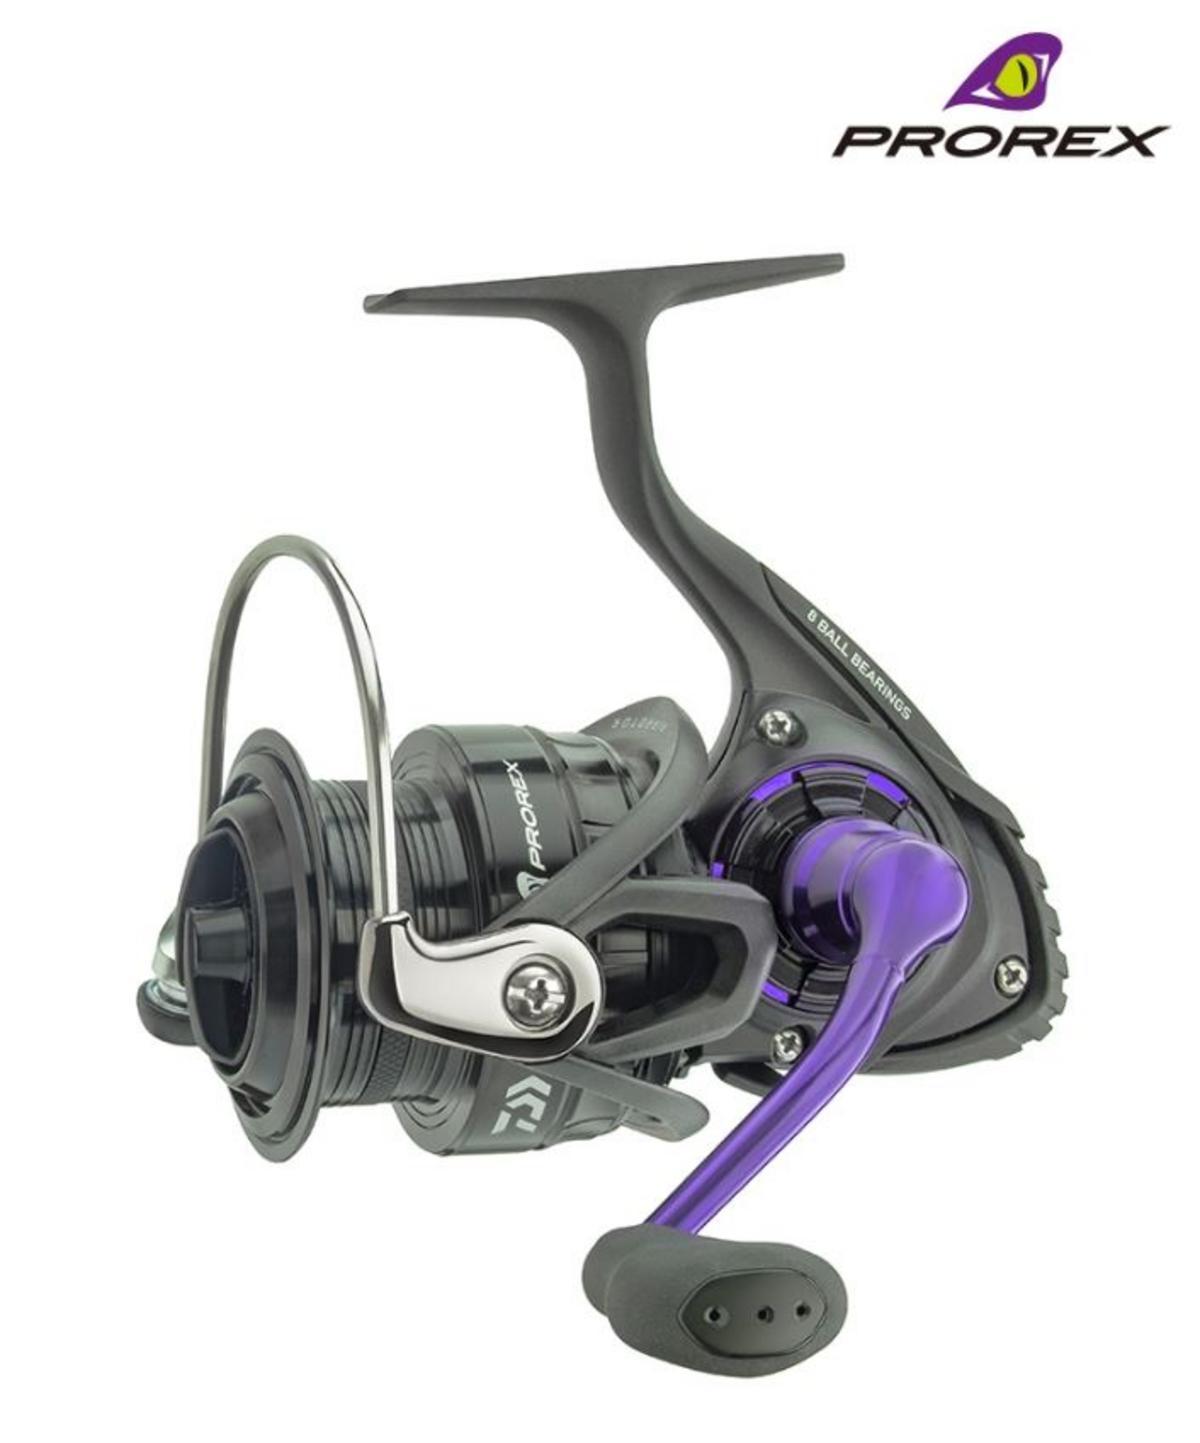 New Daiwa Prorex 2000A Spinning Reel  Pike / Predator - PX2000A